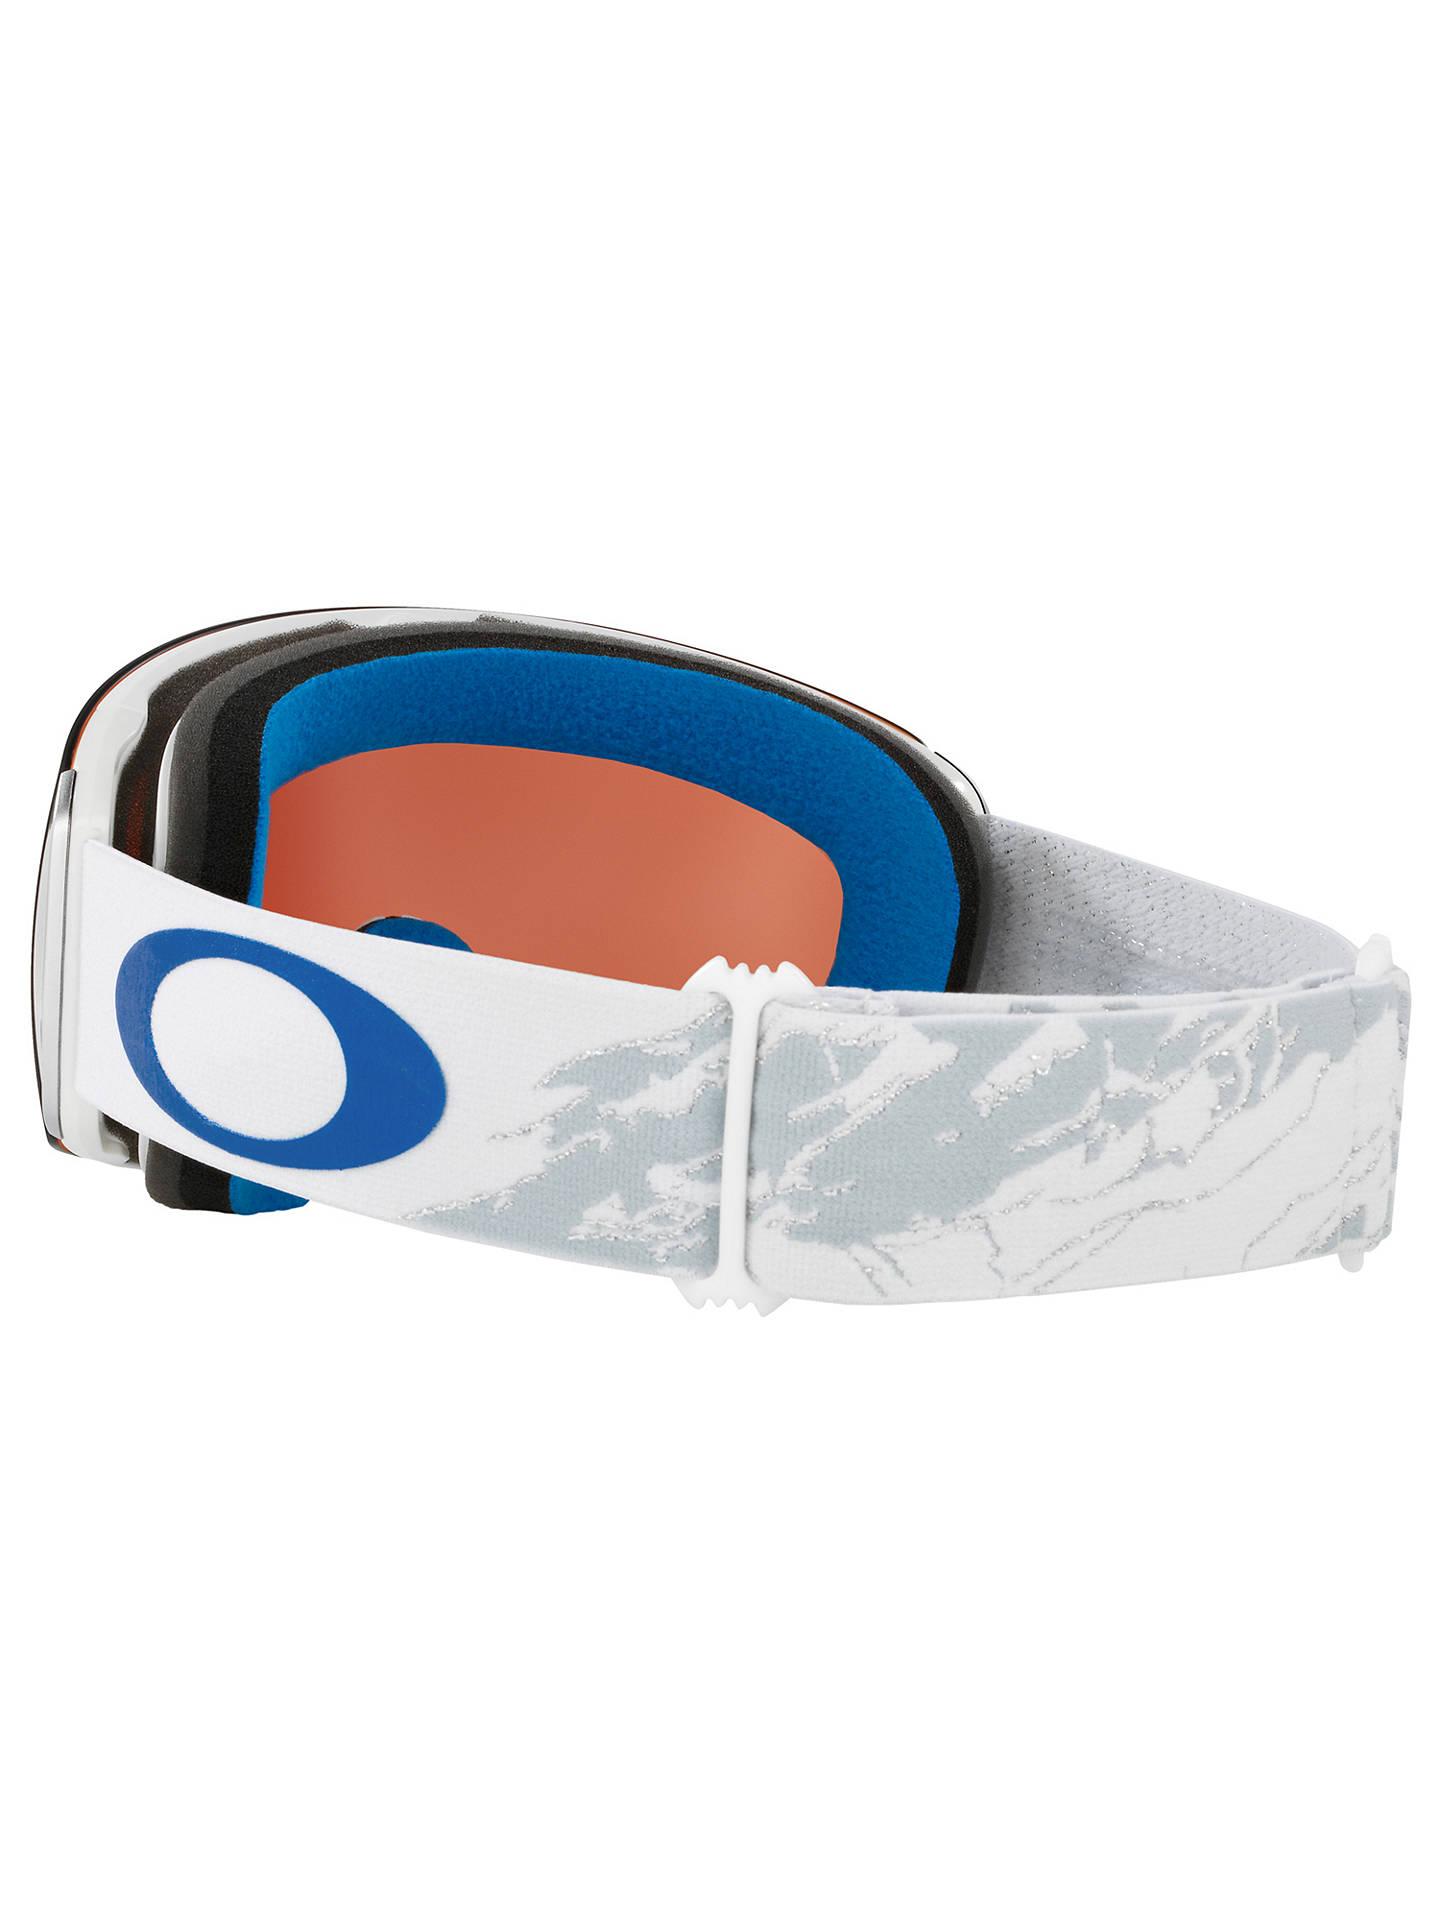 d1a2ef5c28 ... Buy Oakley OO7064 Flight Deck™ XM Lindsey Vonn Prizm™ Snow Goggles